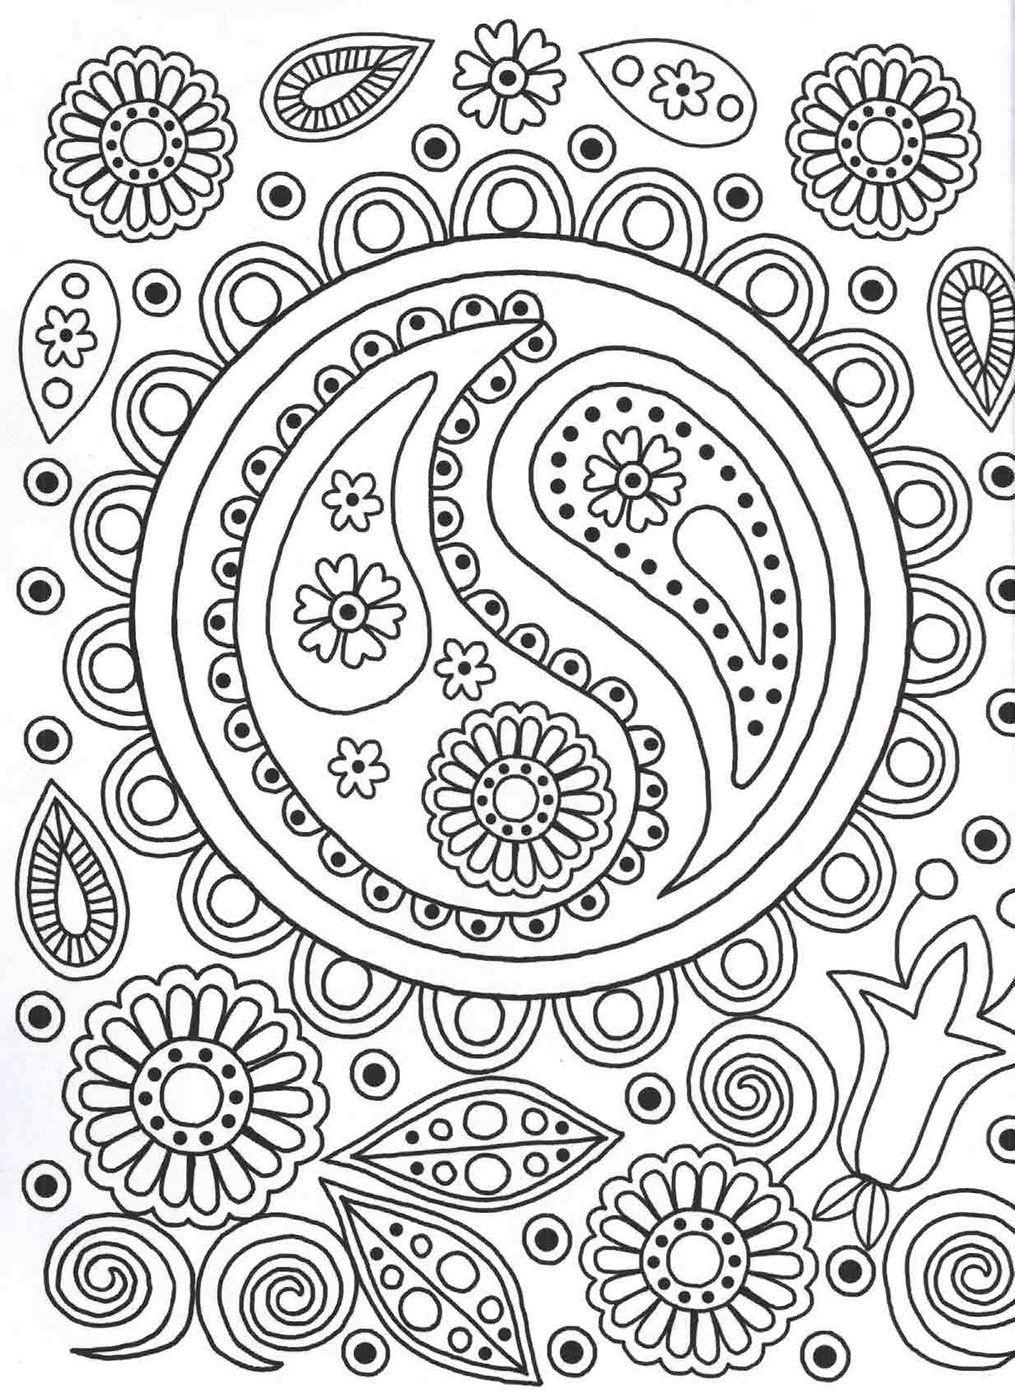 Coloring pages yin yang - Ying Yang Colouring Page Patterns Colouring Book